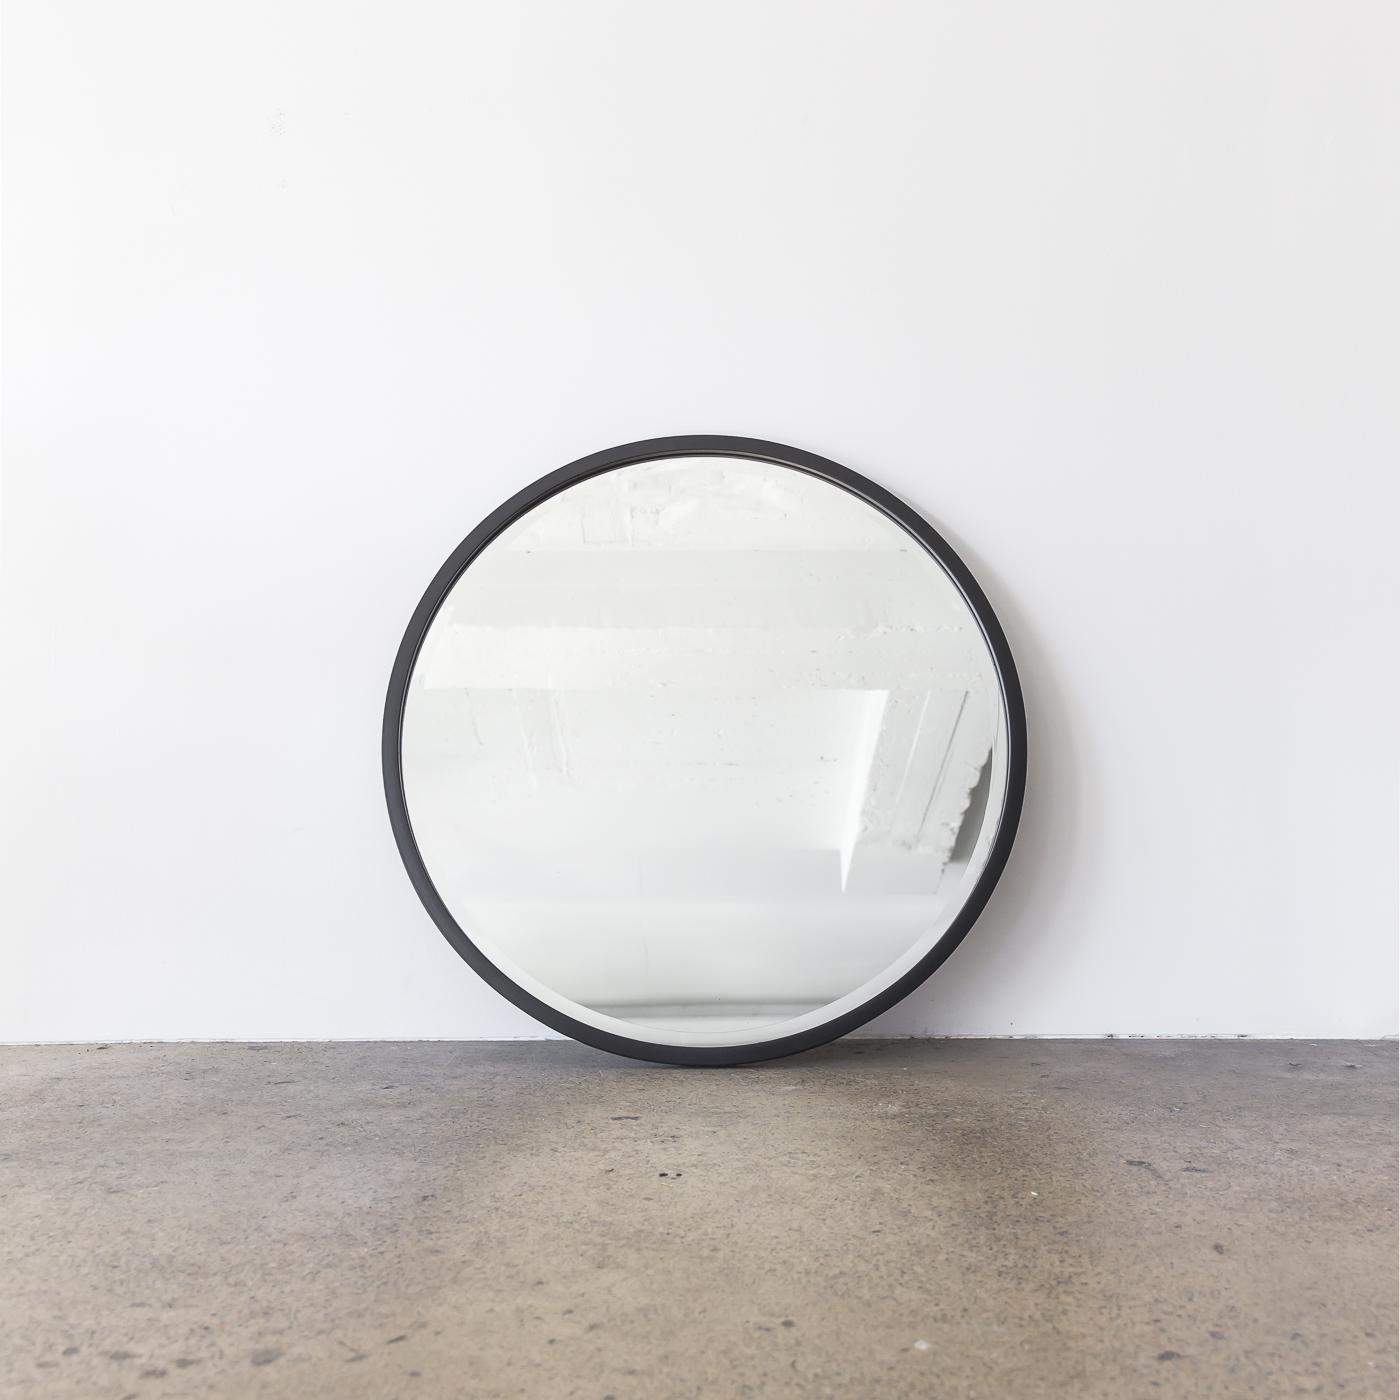 Onyx_Mirror_Small_76cm_Establishing_Project82.jpg